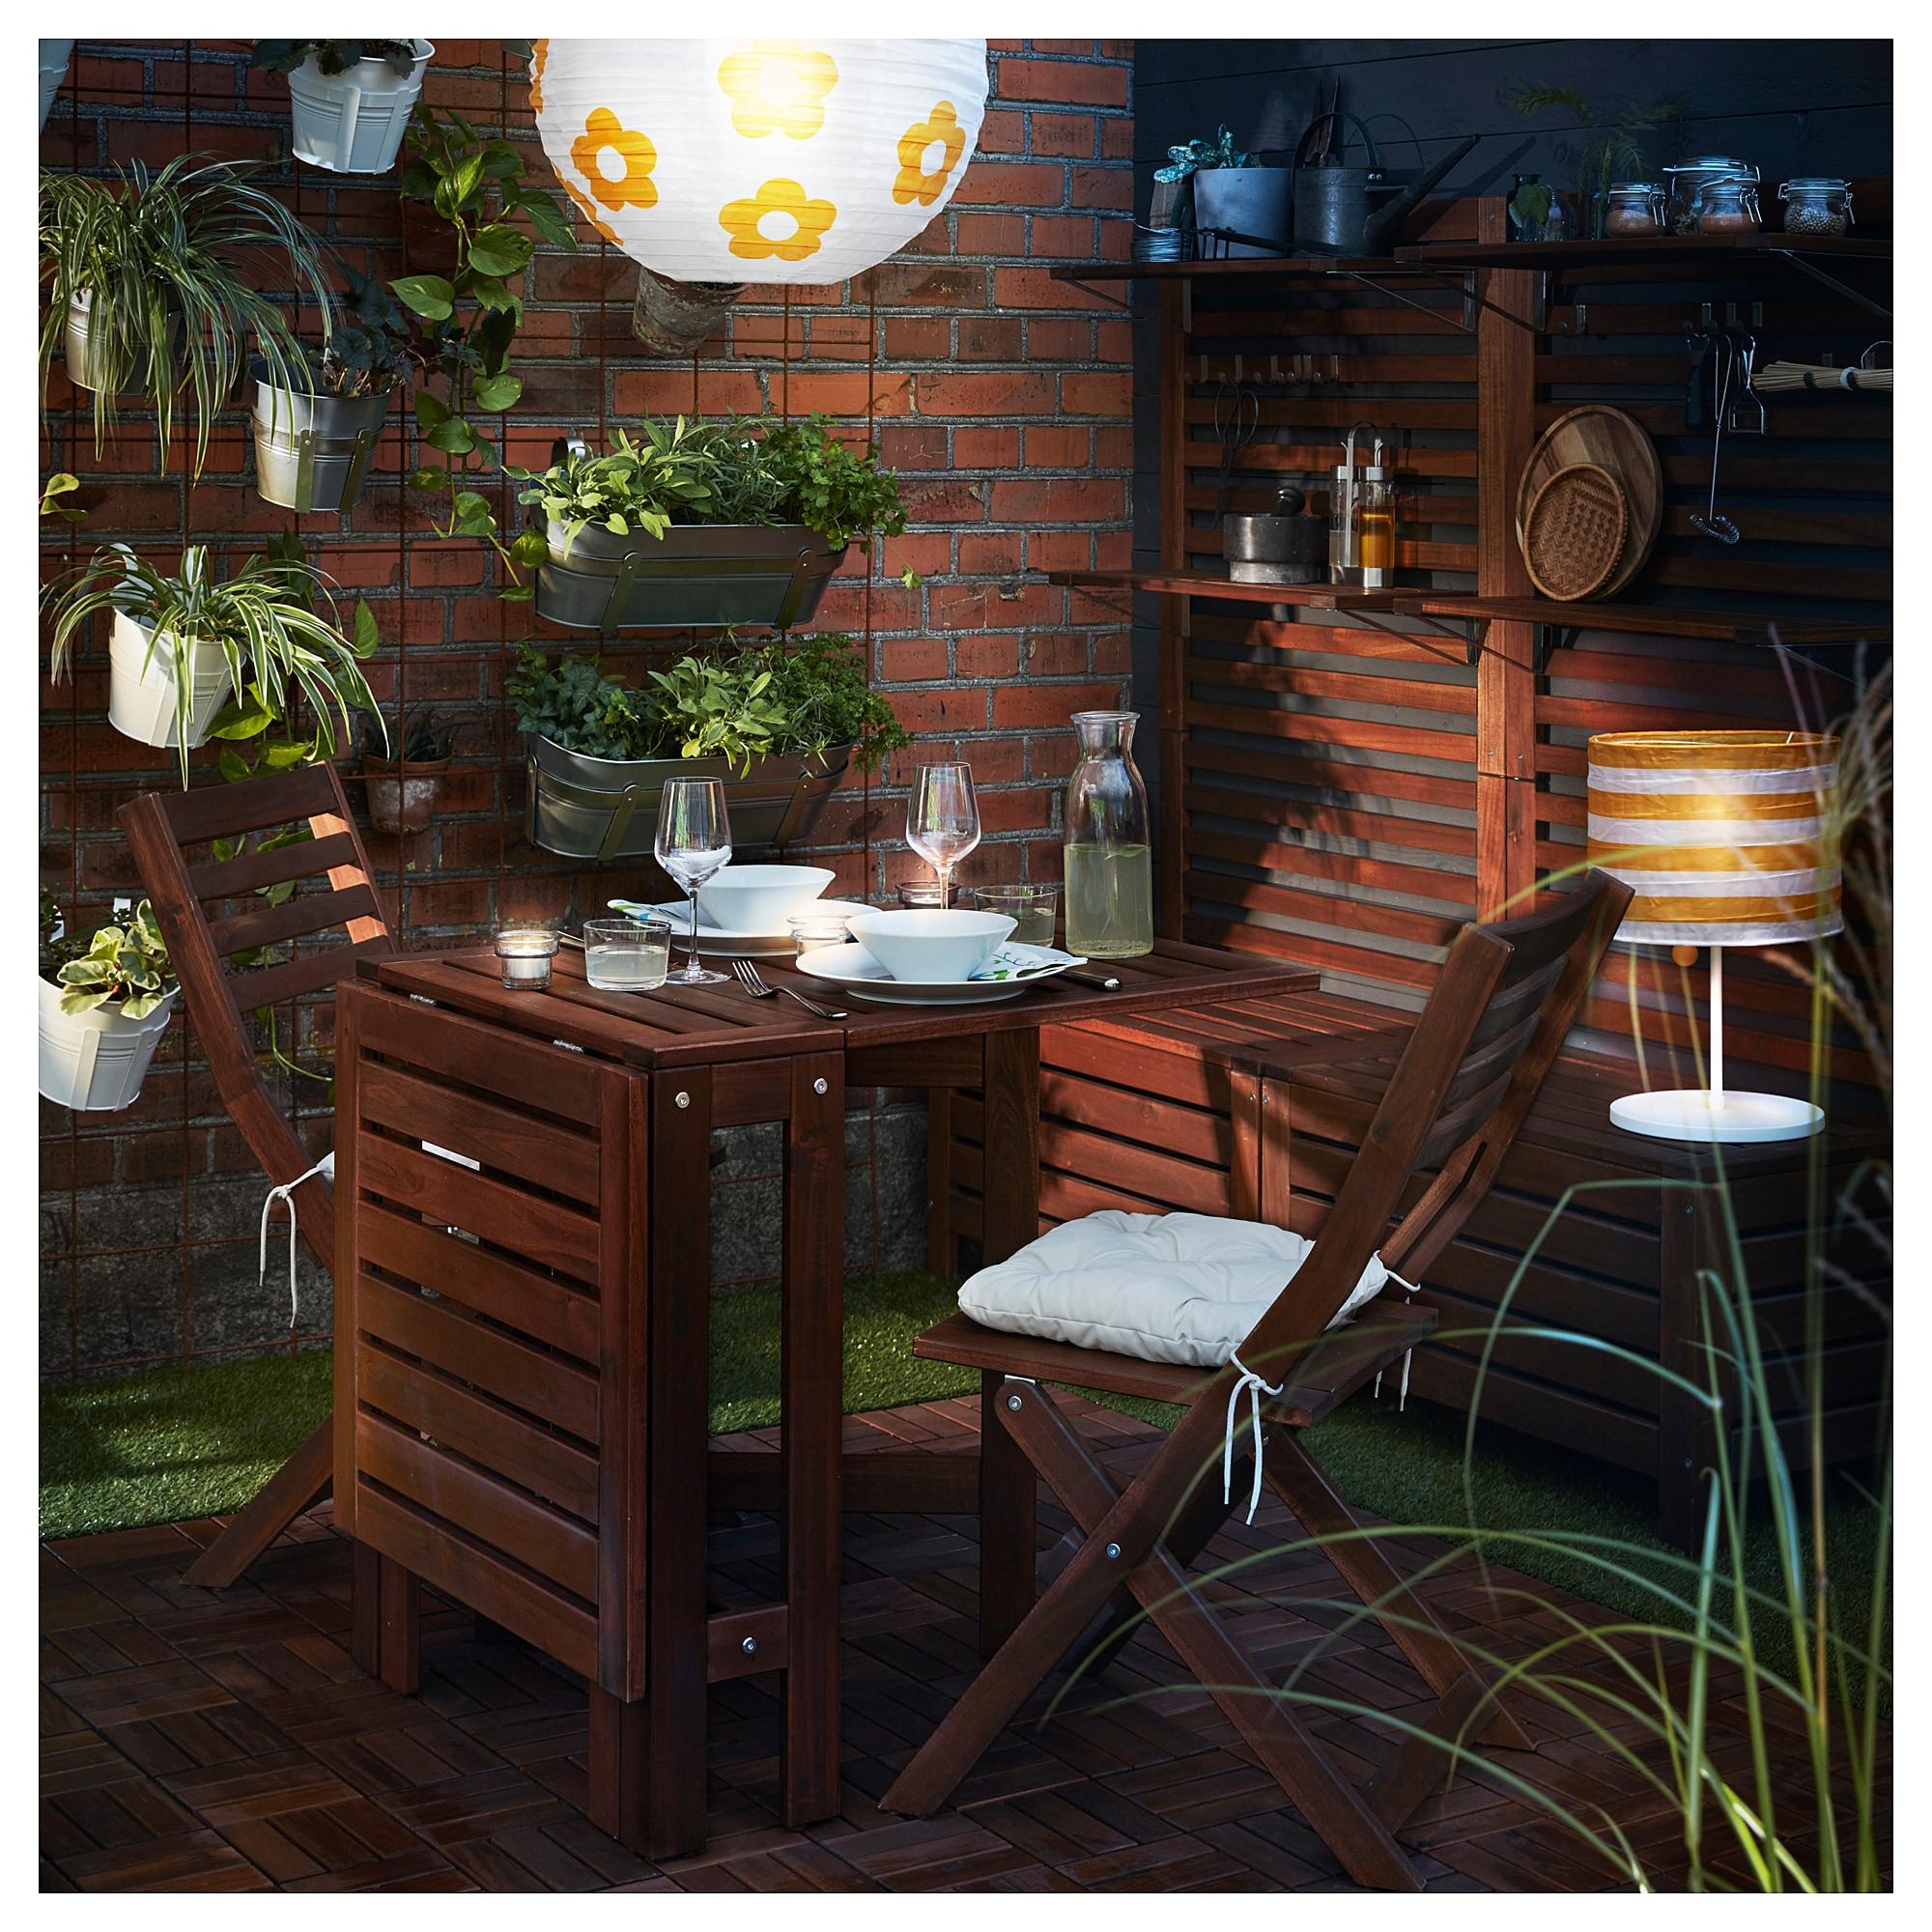 Applaro Stuhl Aussen Braun Faltbar Las Ikea Outdoor Klapptisch